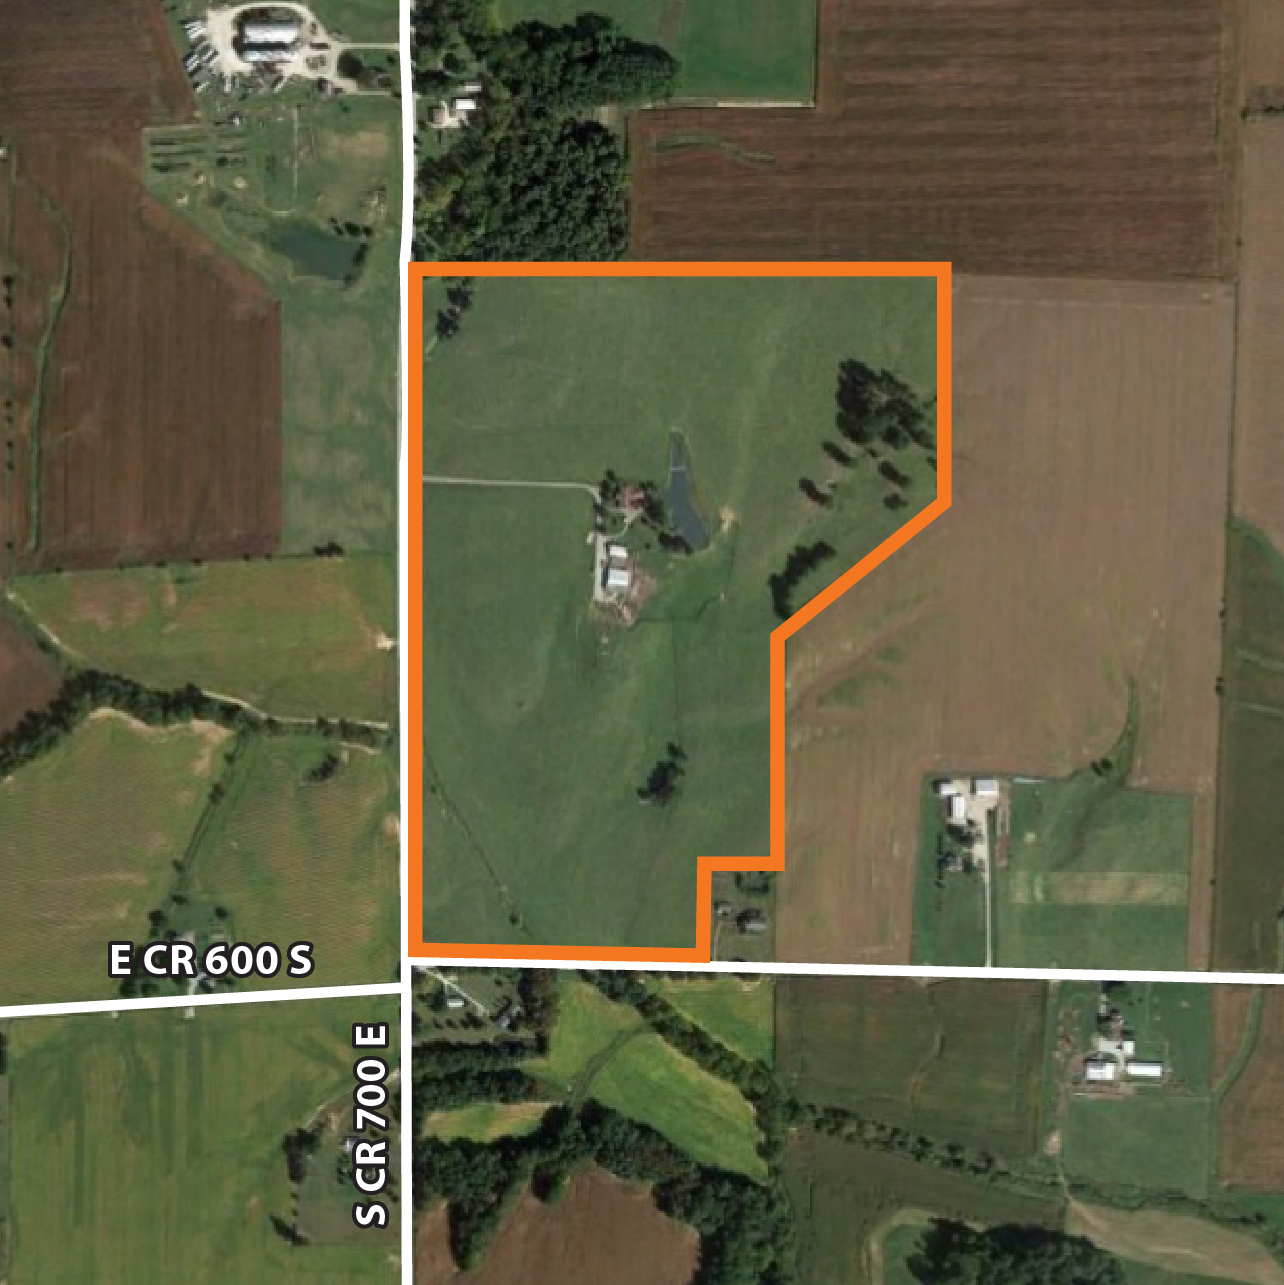 Property Listings - Halderman Farm Management & Real Estate